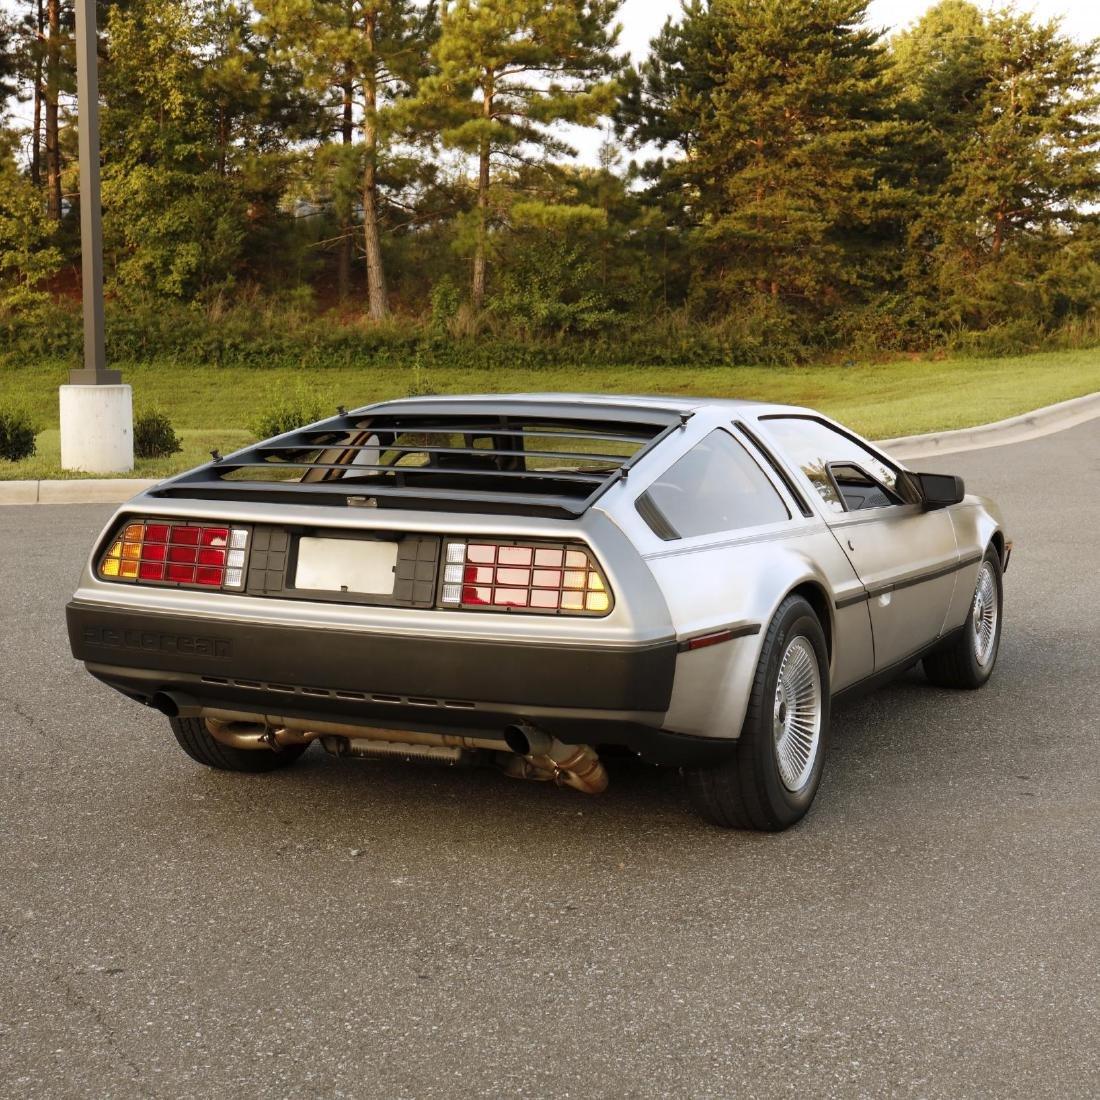 1981 DeLorean DMC-12 - 5